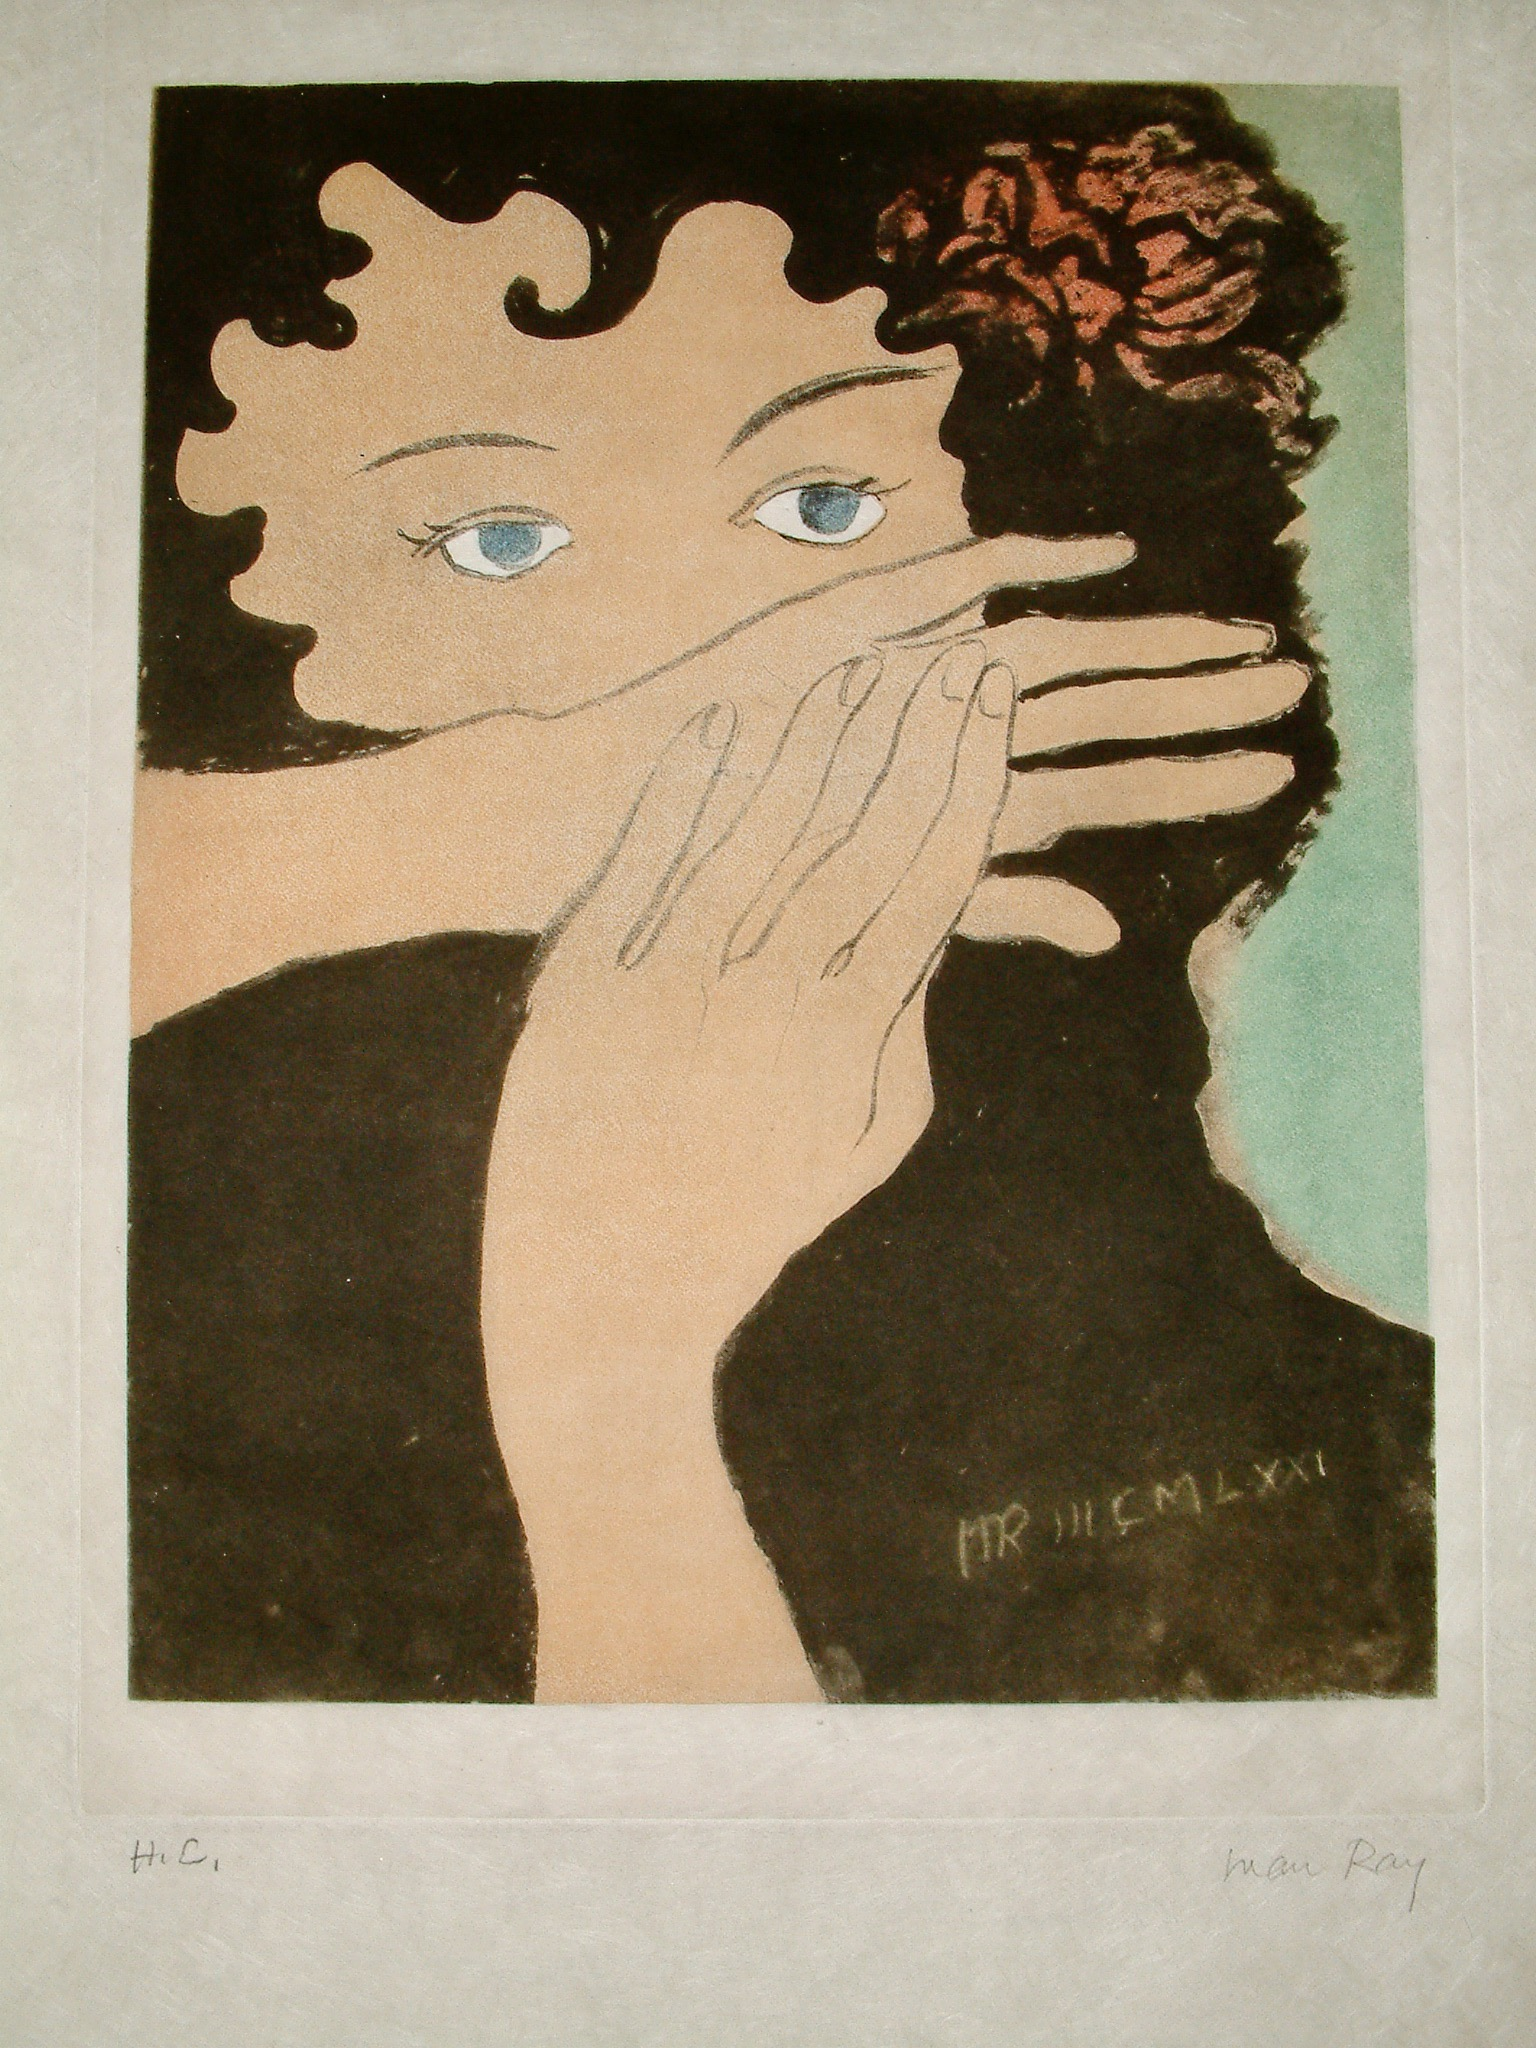 La Peur by Man Ray